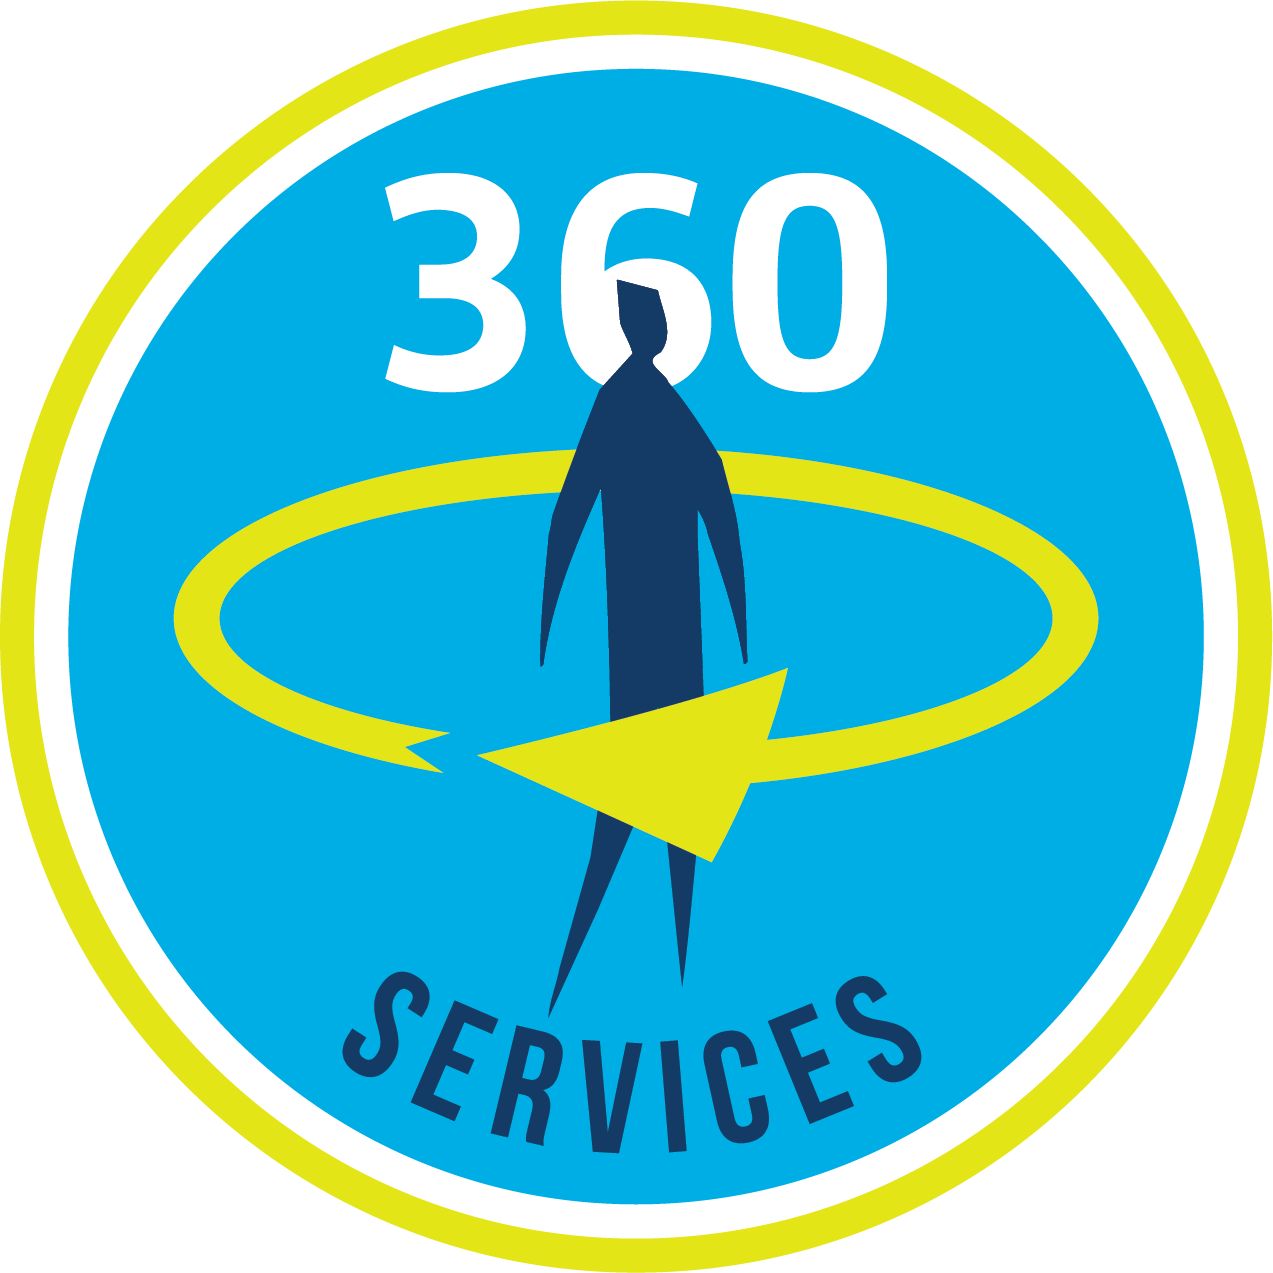 aclvb-universele_diensten-logo-cmyk_ok_fr_8.png